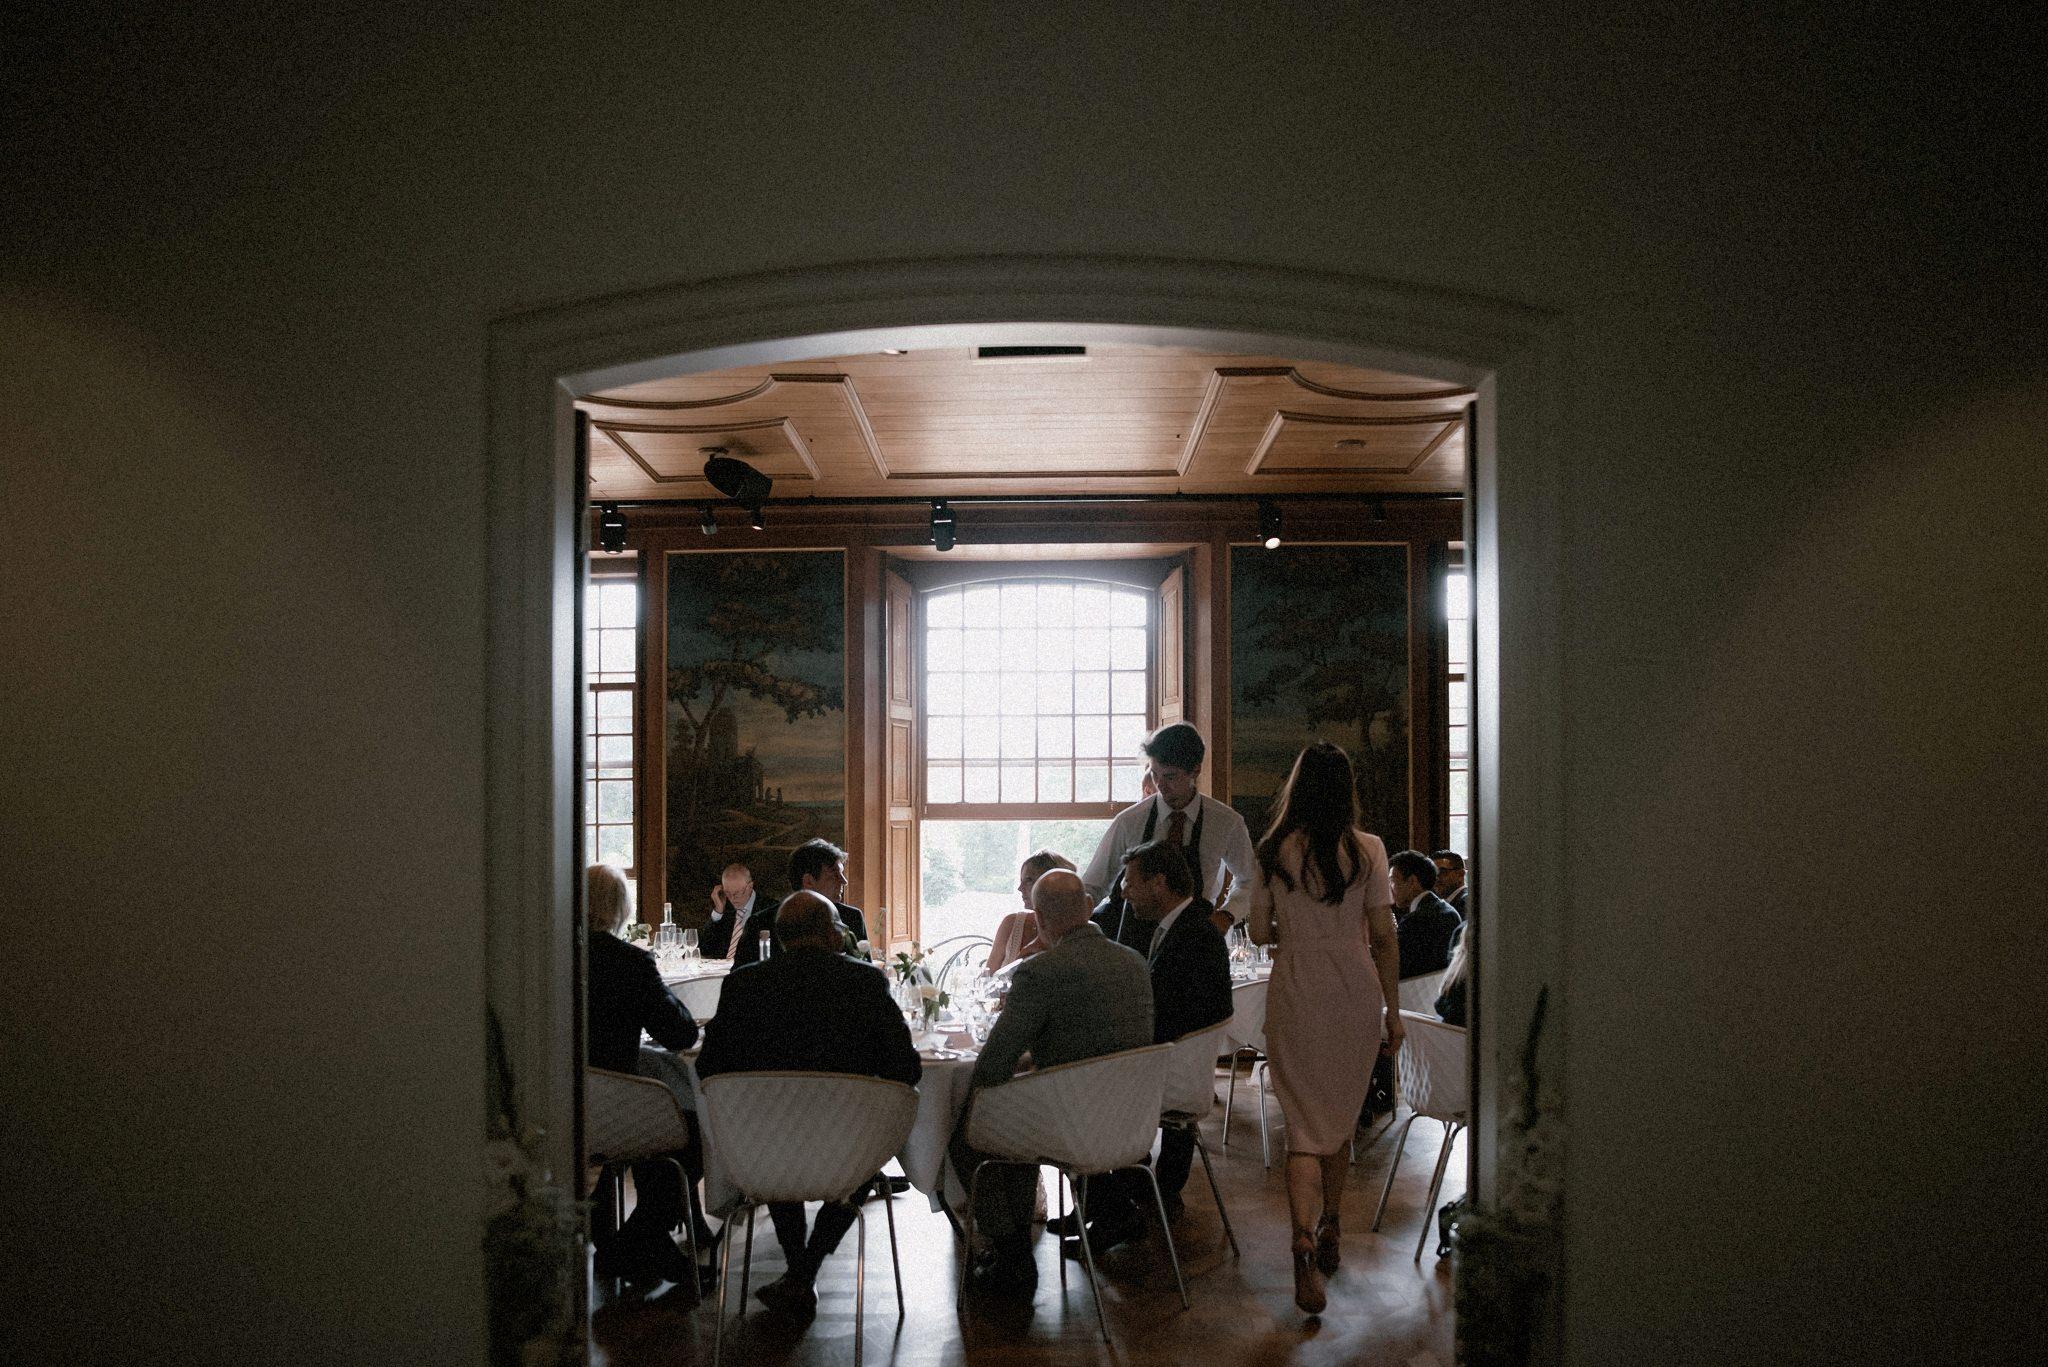 Bruidsfotografie Buitenplaats Sparrendaal - Naomi van der Kraan 0065.jpg